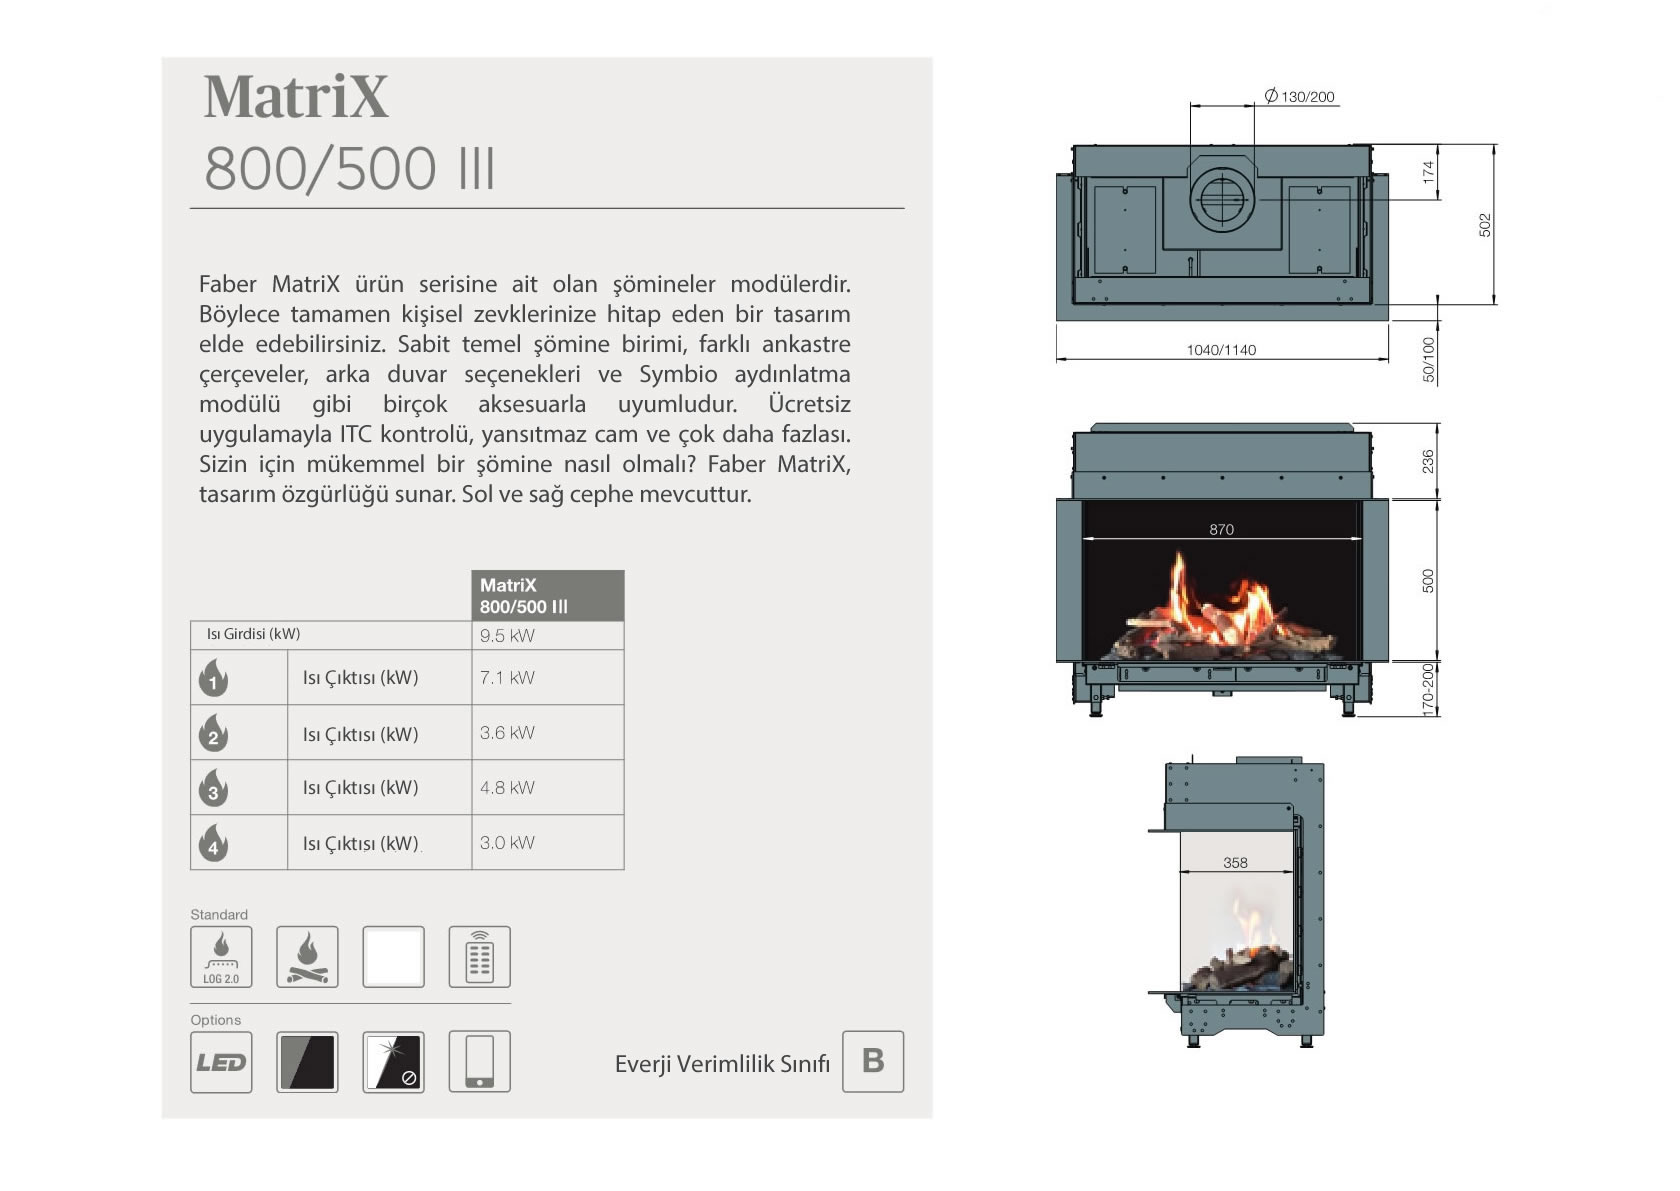 Faber Natural Gas Fireplaces - Matrix 800 / 500 III